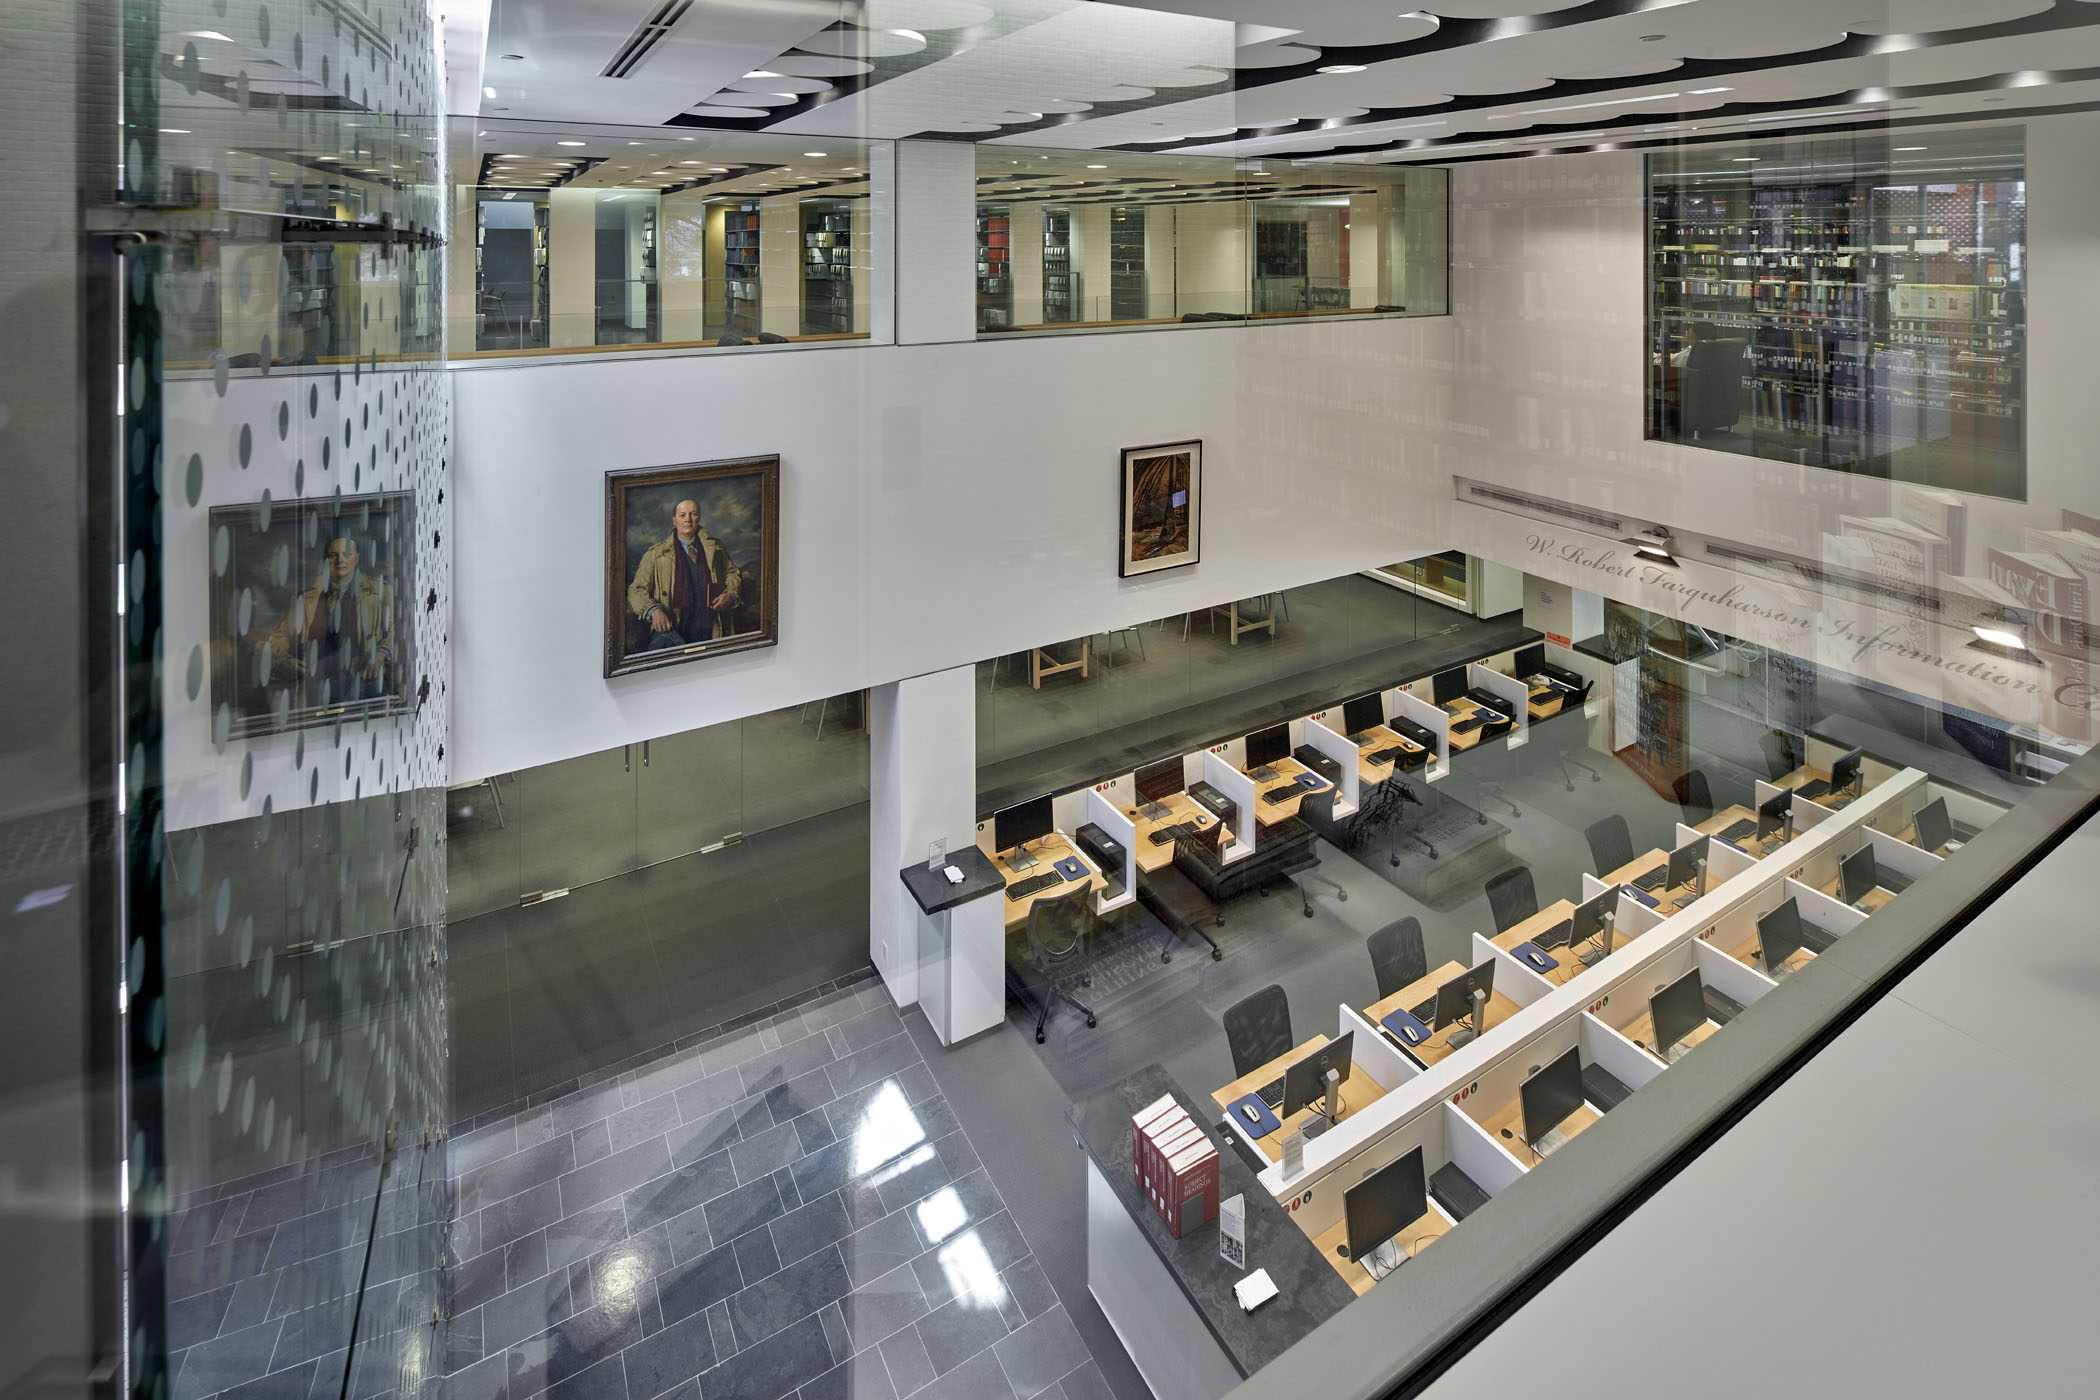 EJ Pratt Library